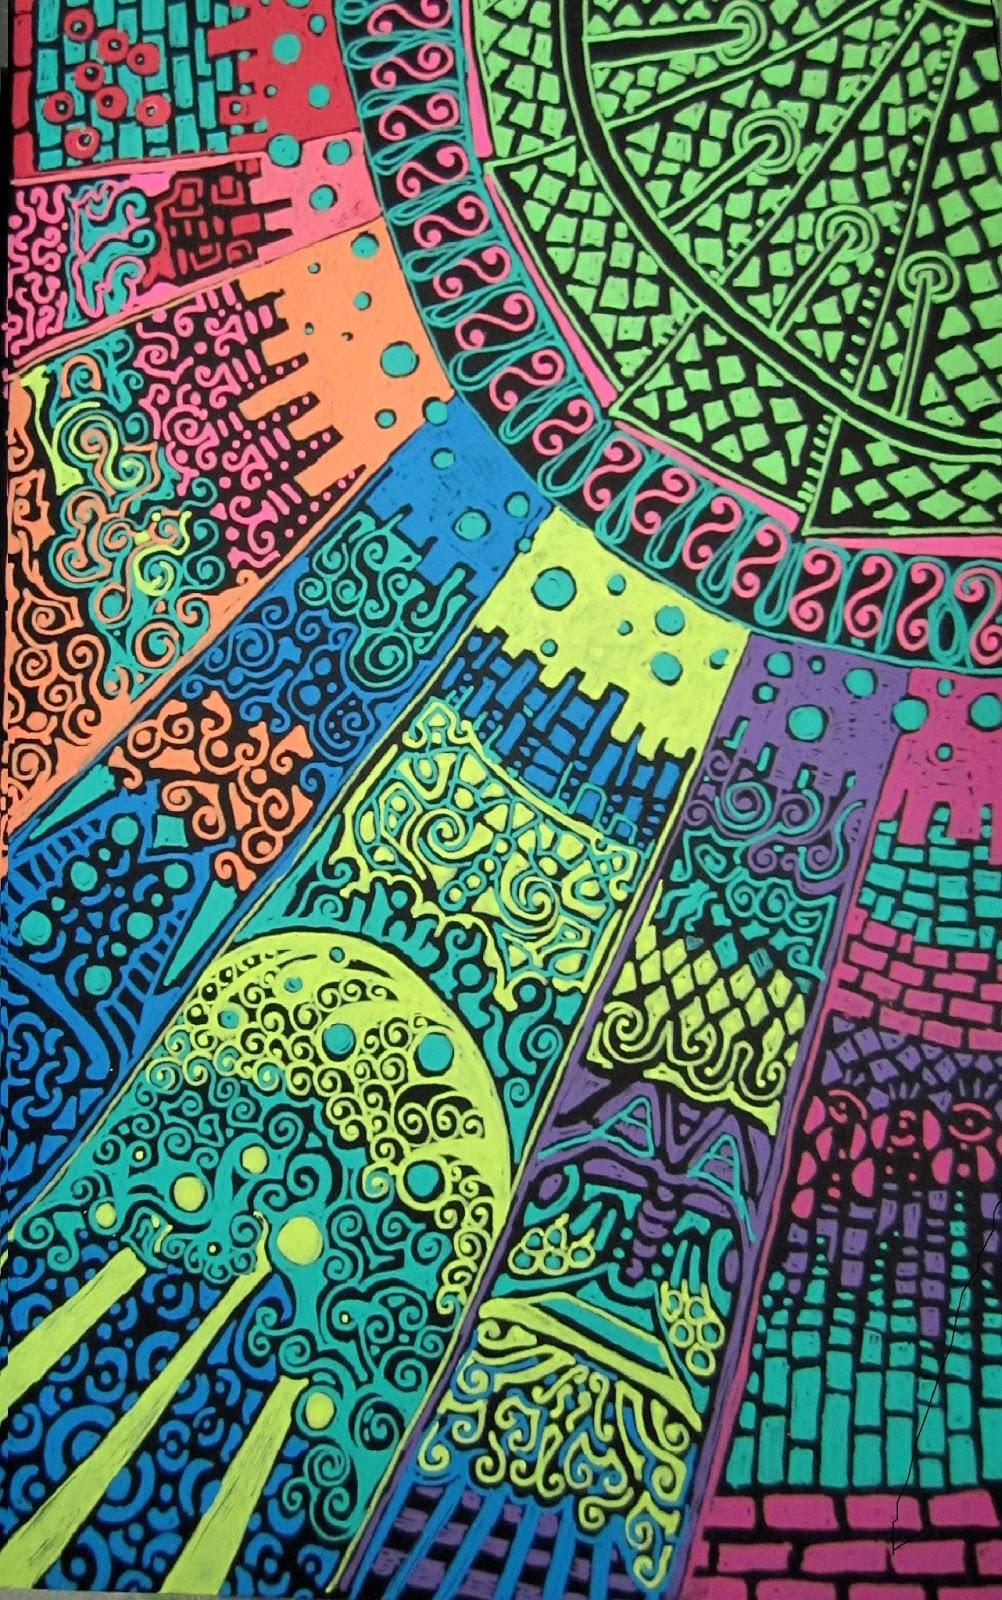 zentangle-inspired art | Life Imitates Doodles | Page 2